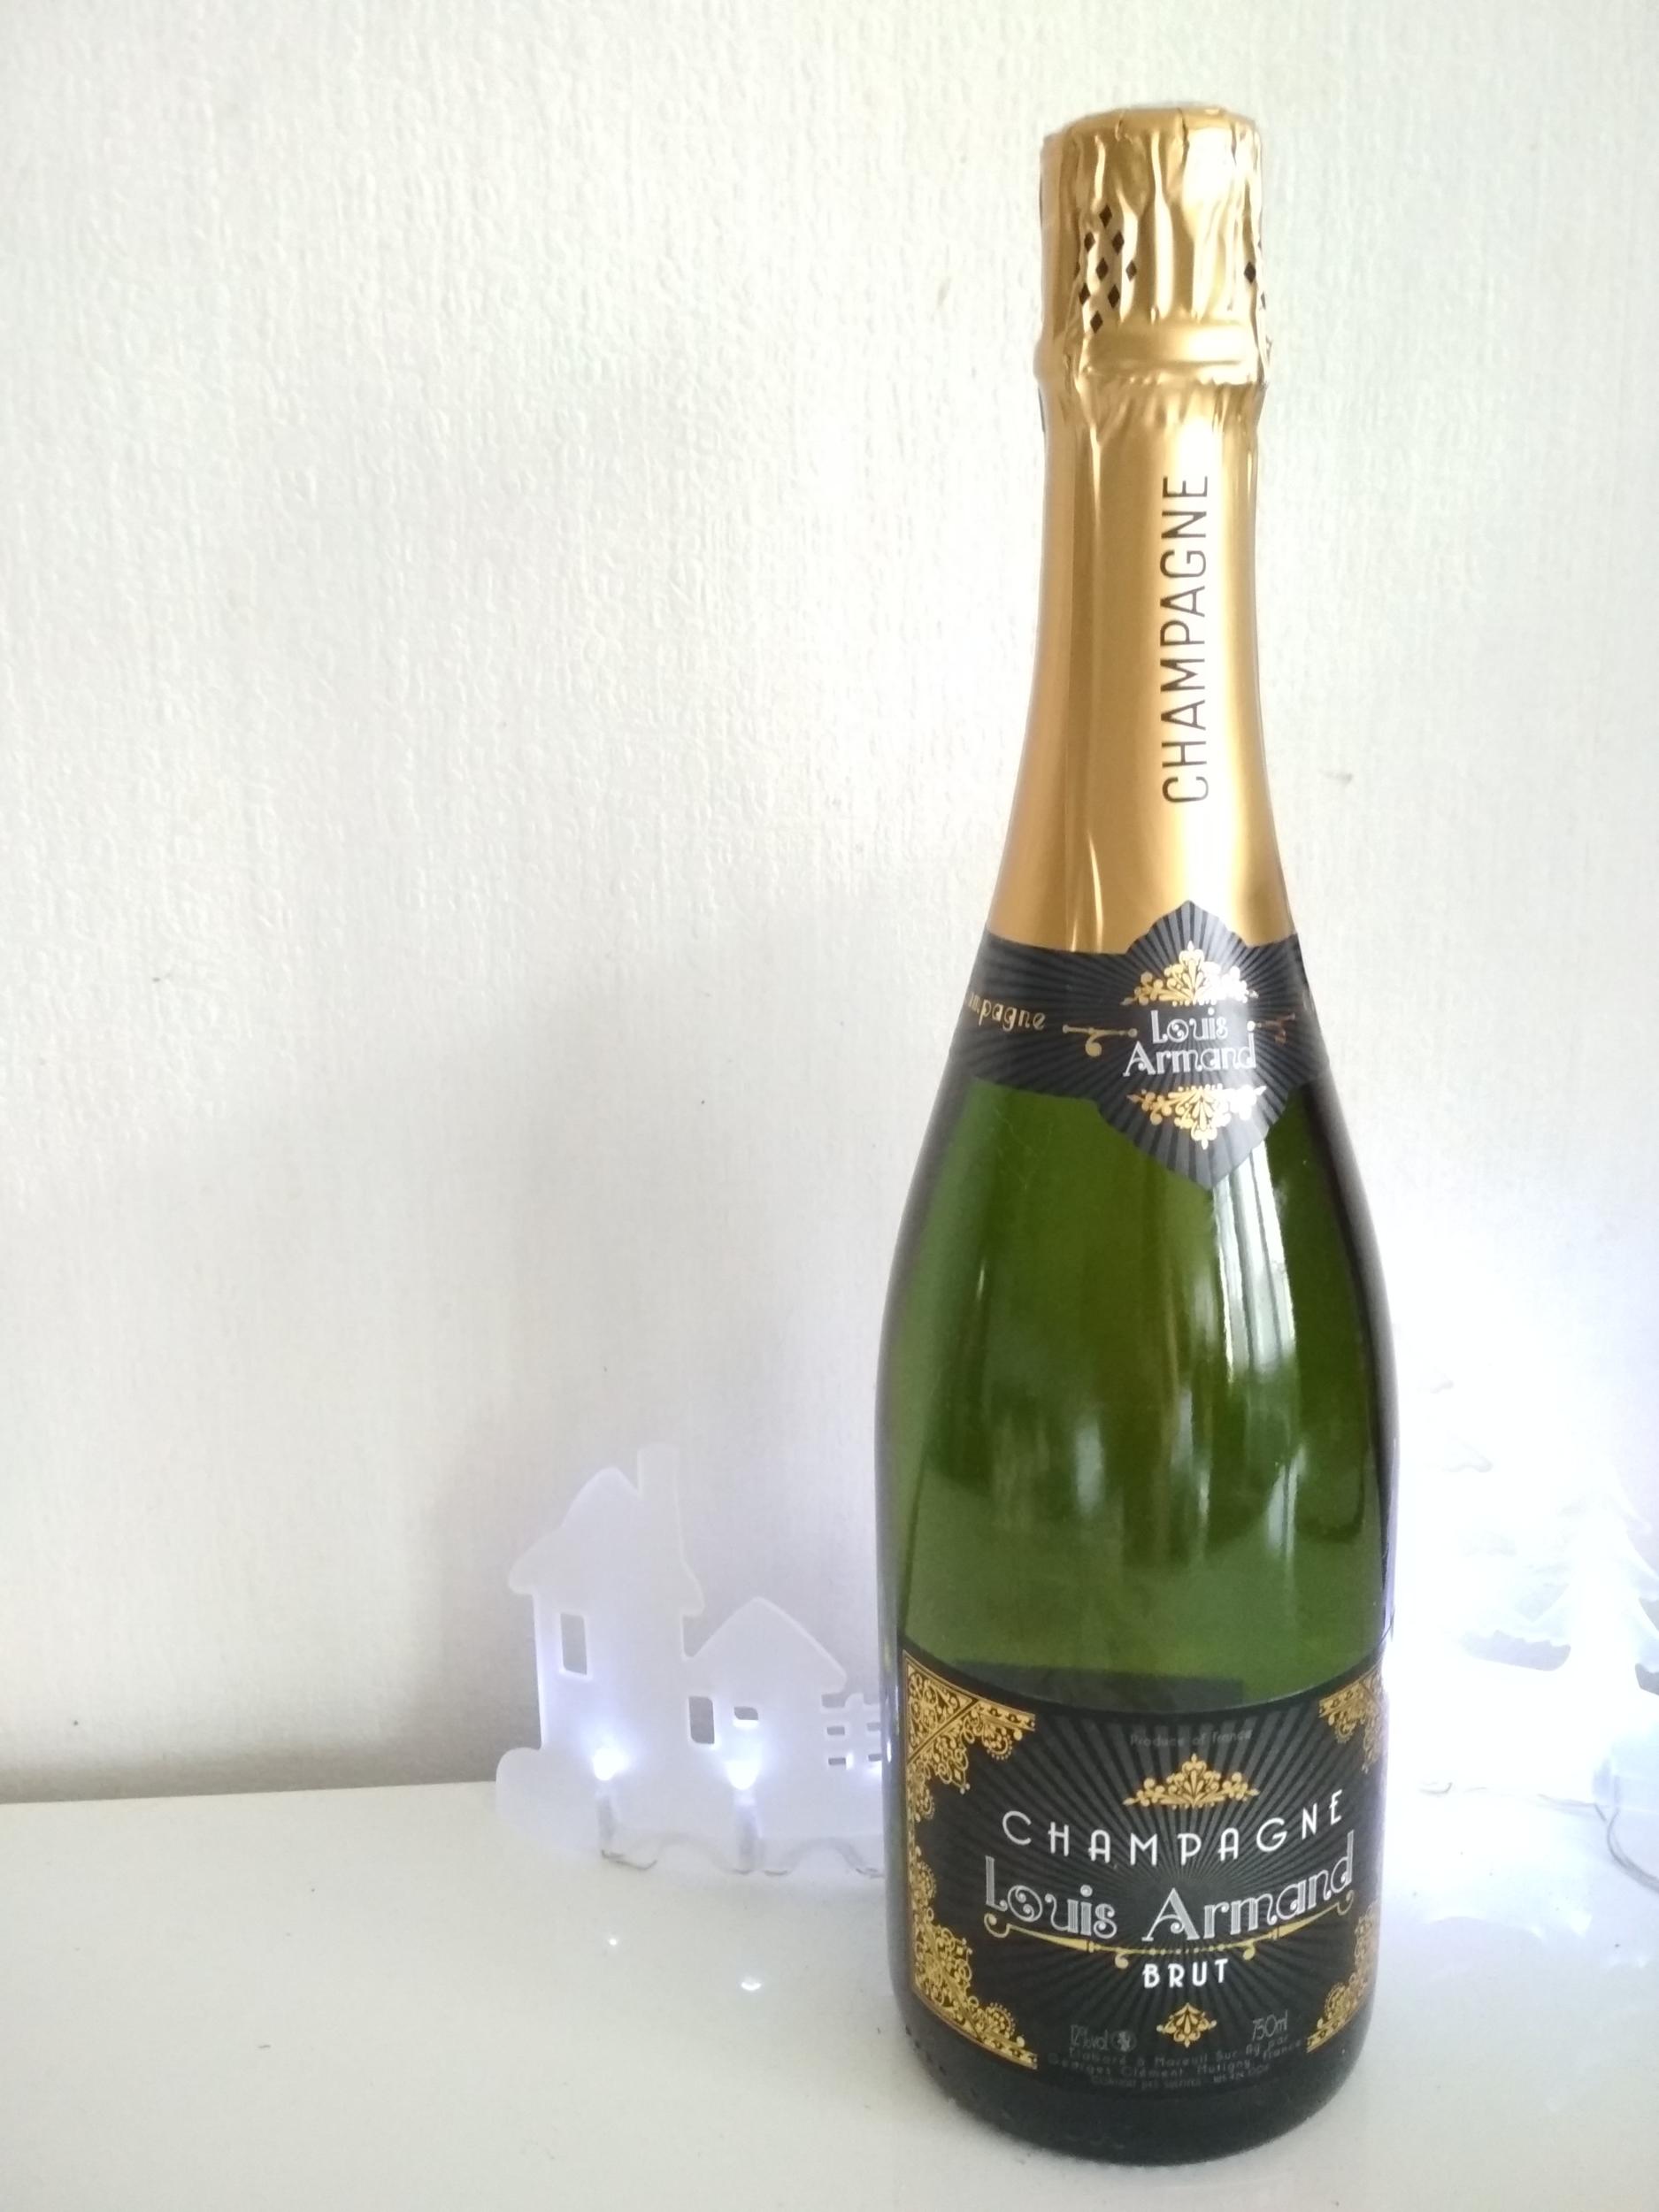 Champagne Louis Armand Brut Blanc 6bts